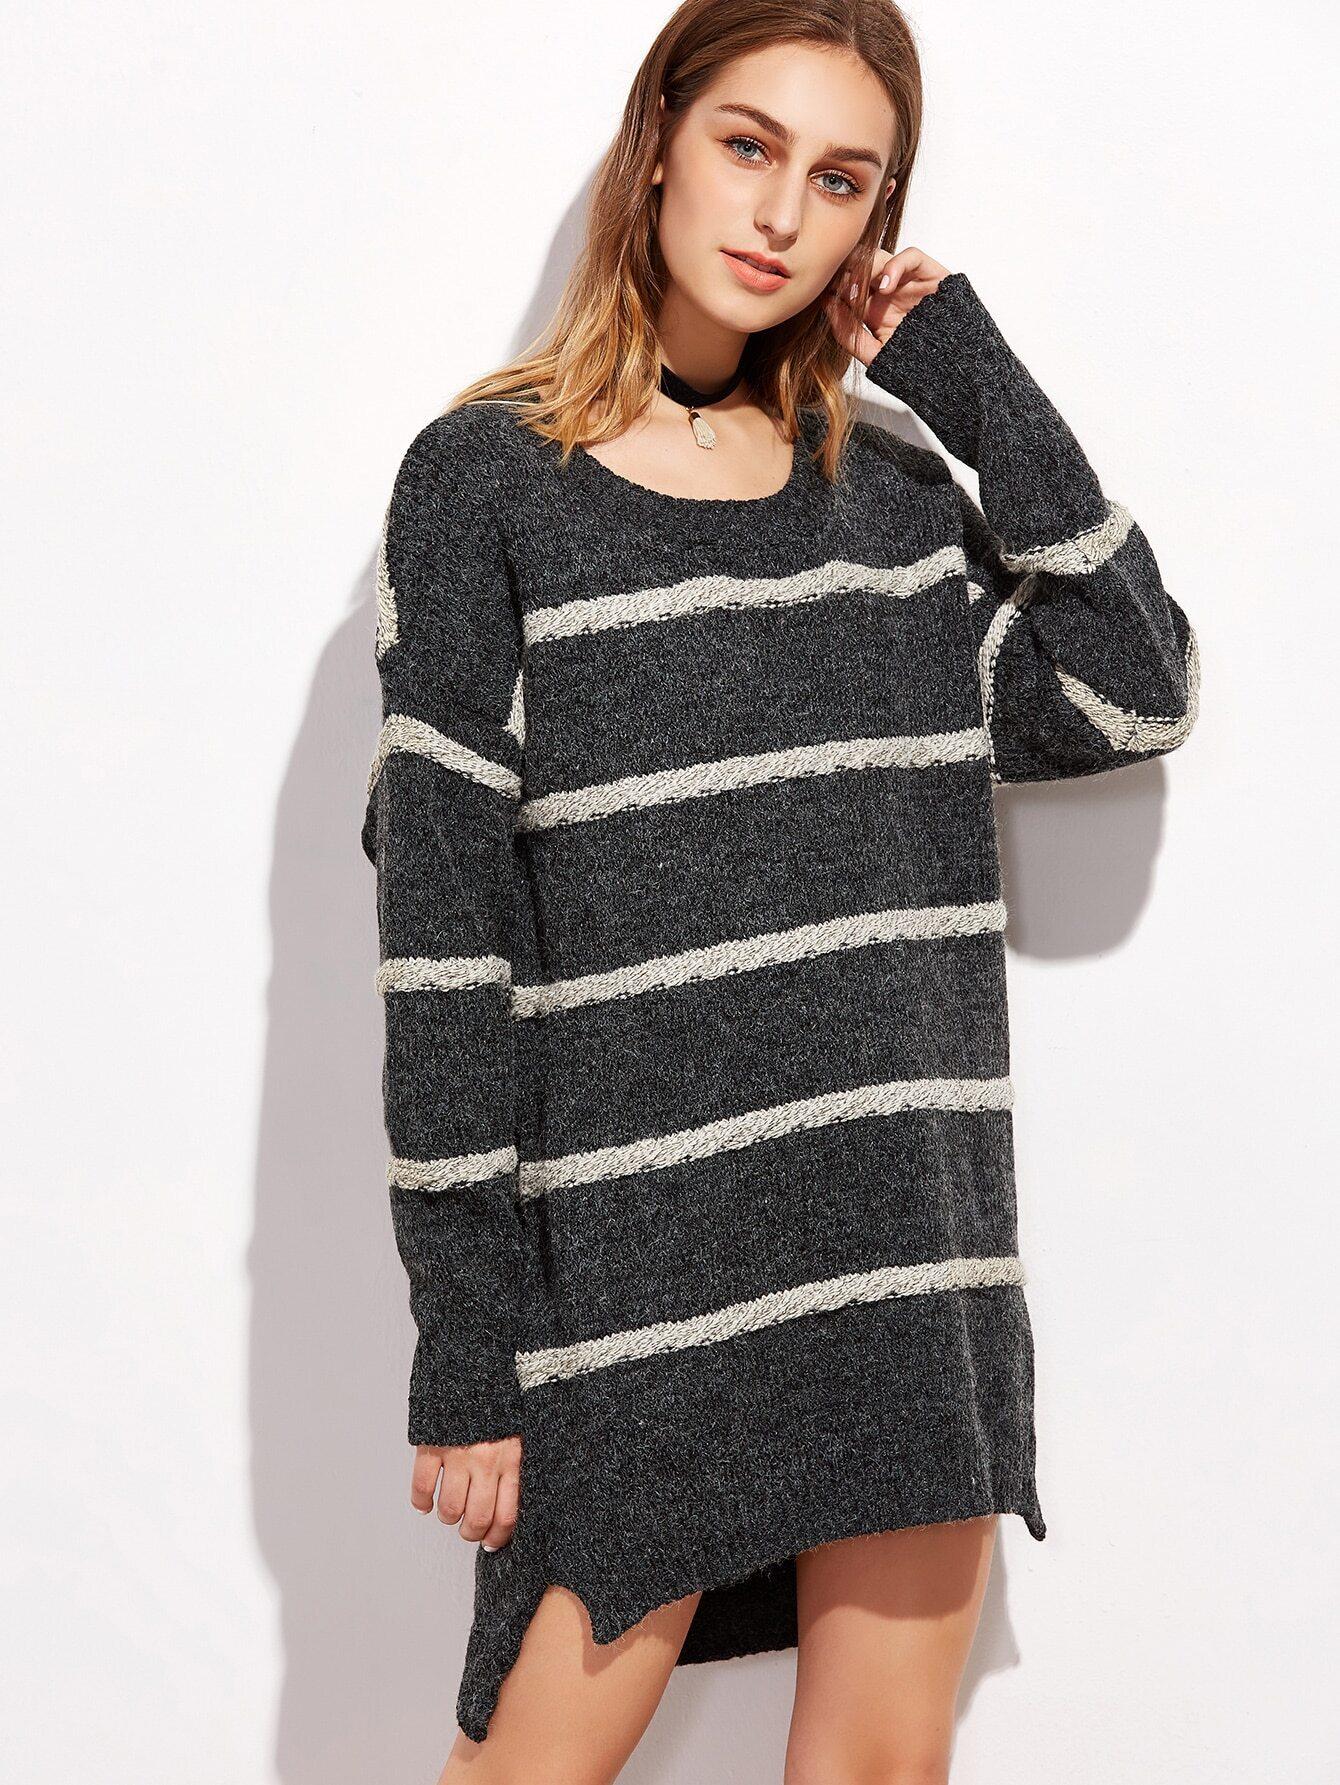 Dark Grey Striped Slit Side High Low Sweater Dress dress161010001